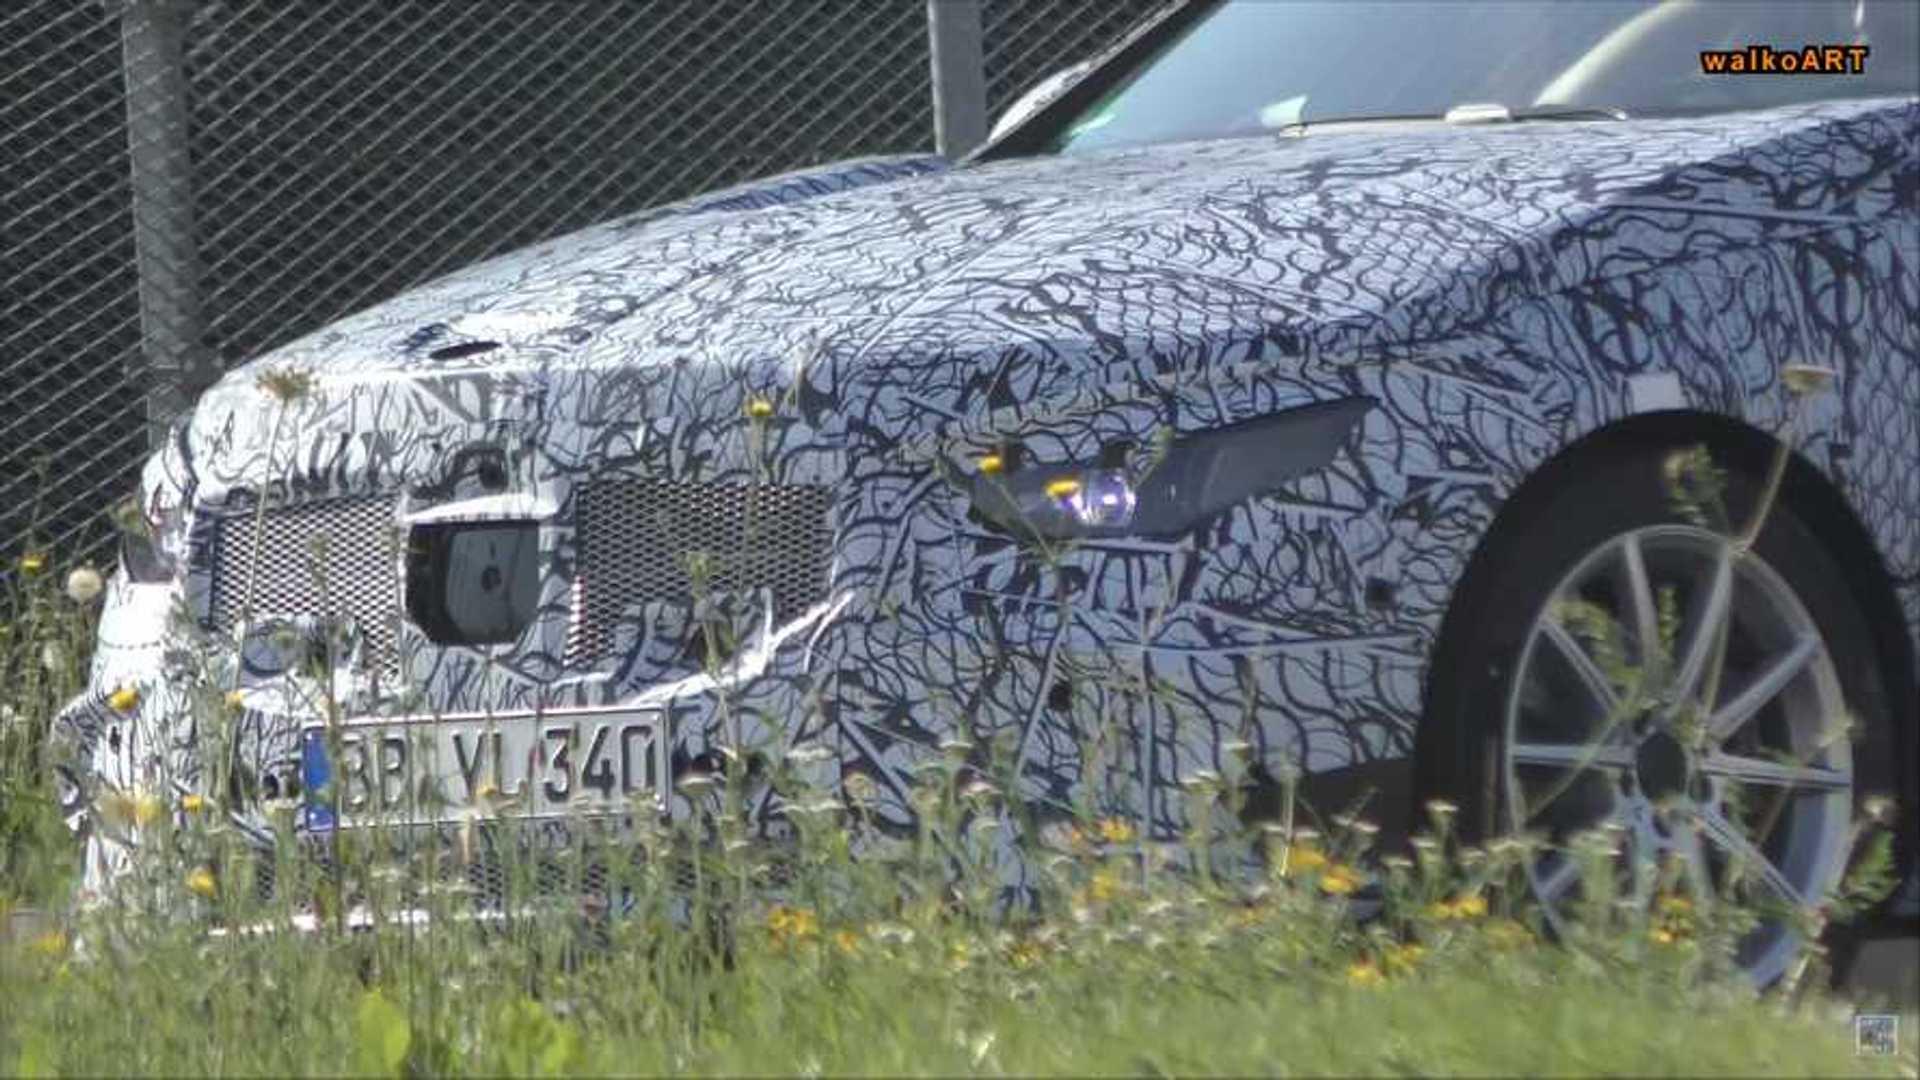 Flagra: Mercedes-Benz Classe C 2021 testa sistemas semi-autônomos 2021-mercedes-benz-c-class-spy-screenshot